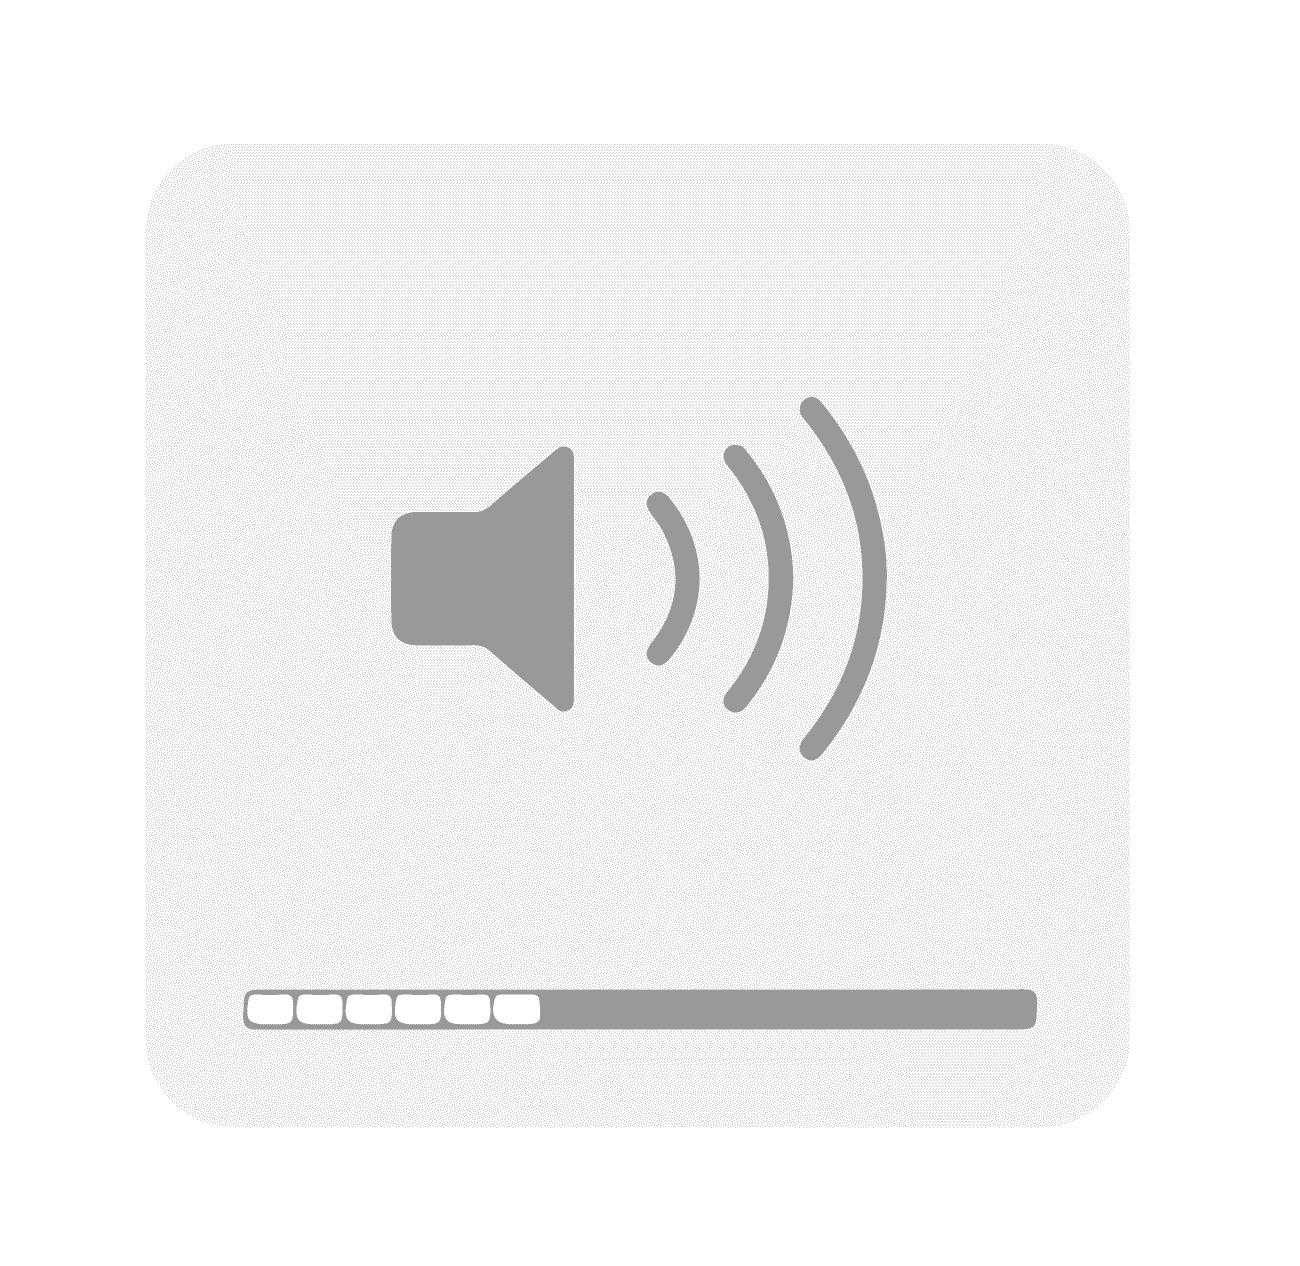 Symbol: Lautstärke verändern